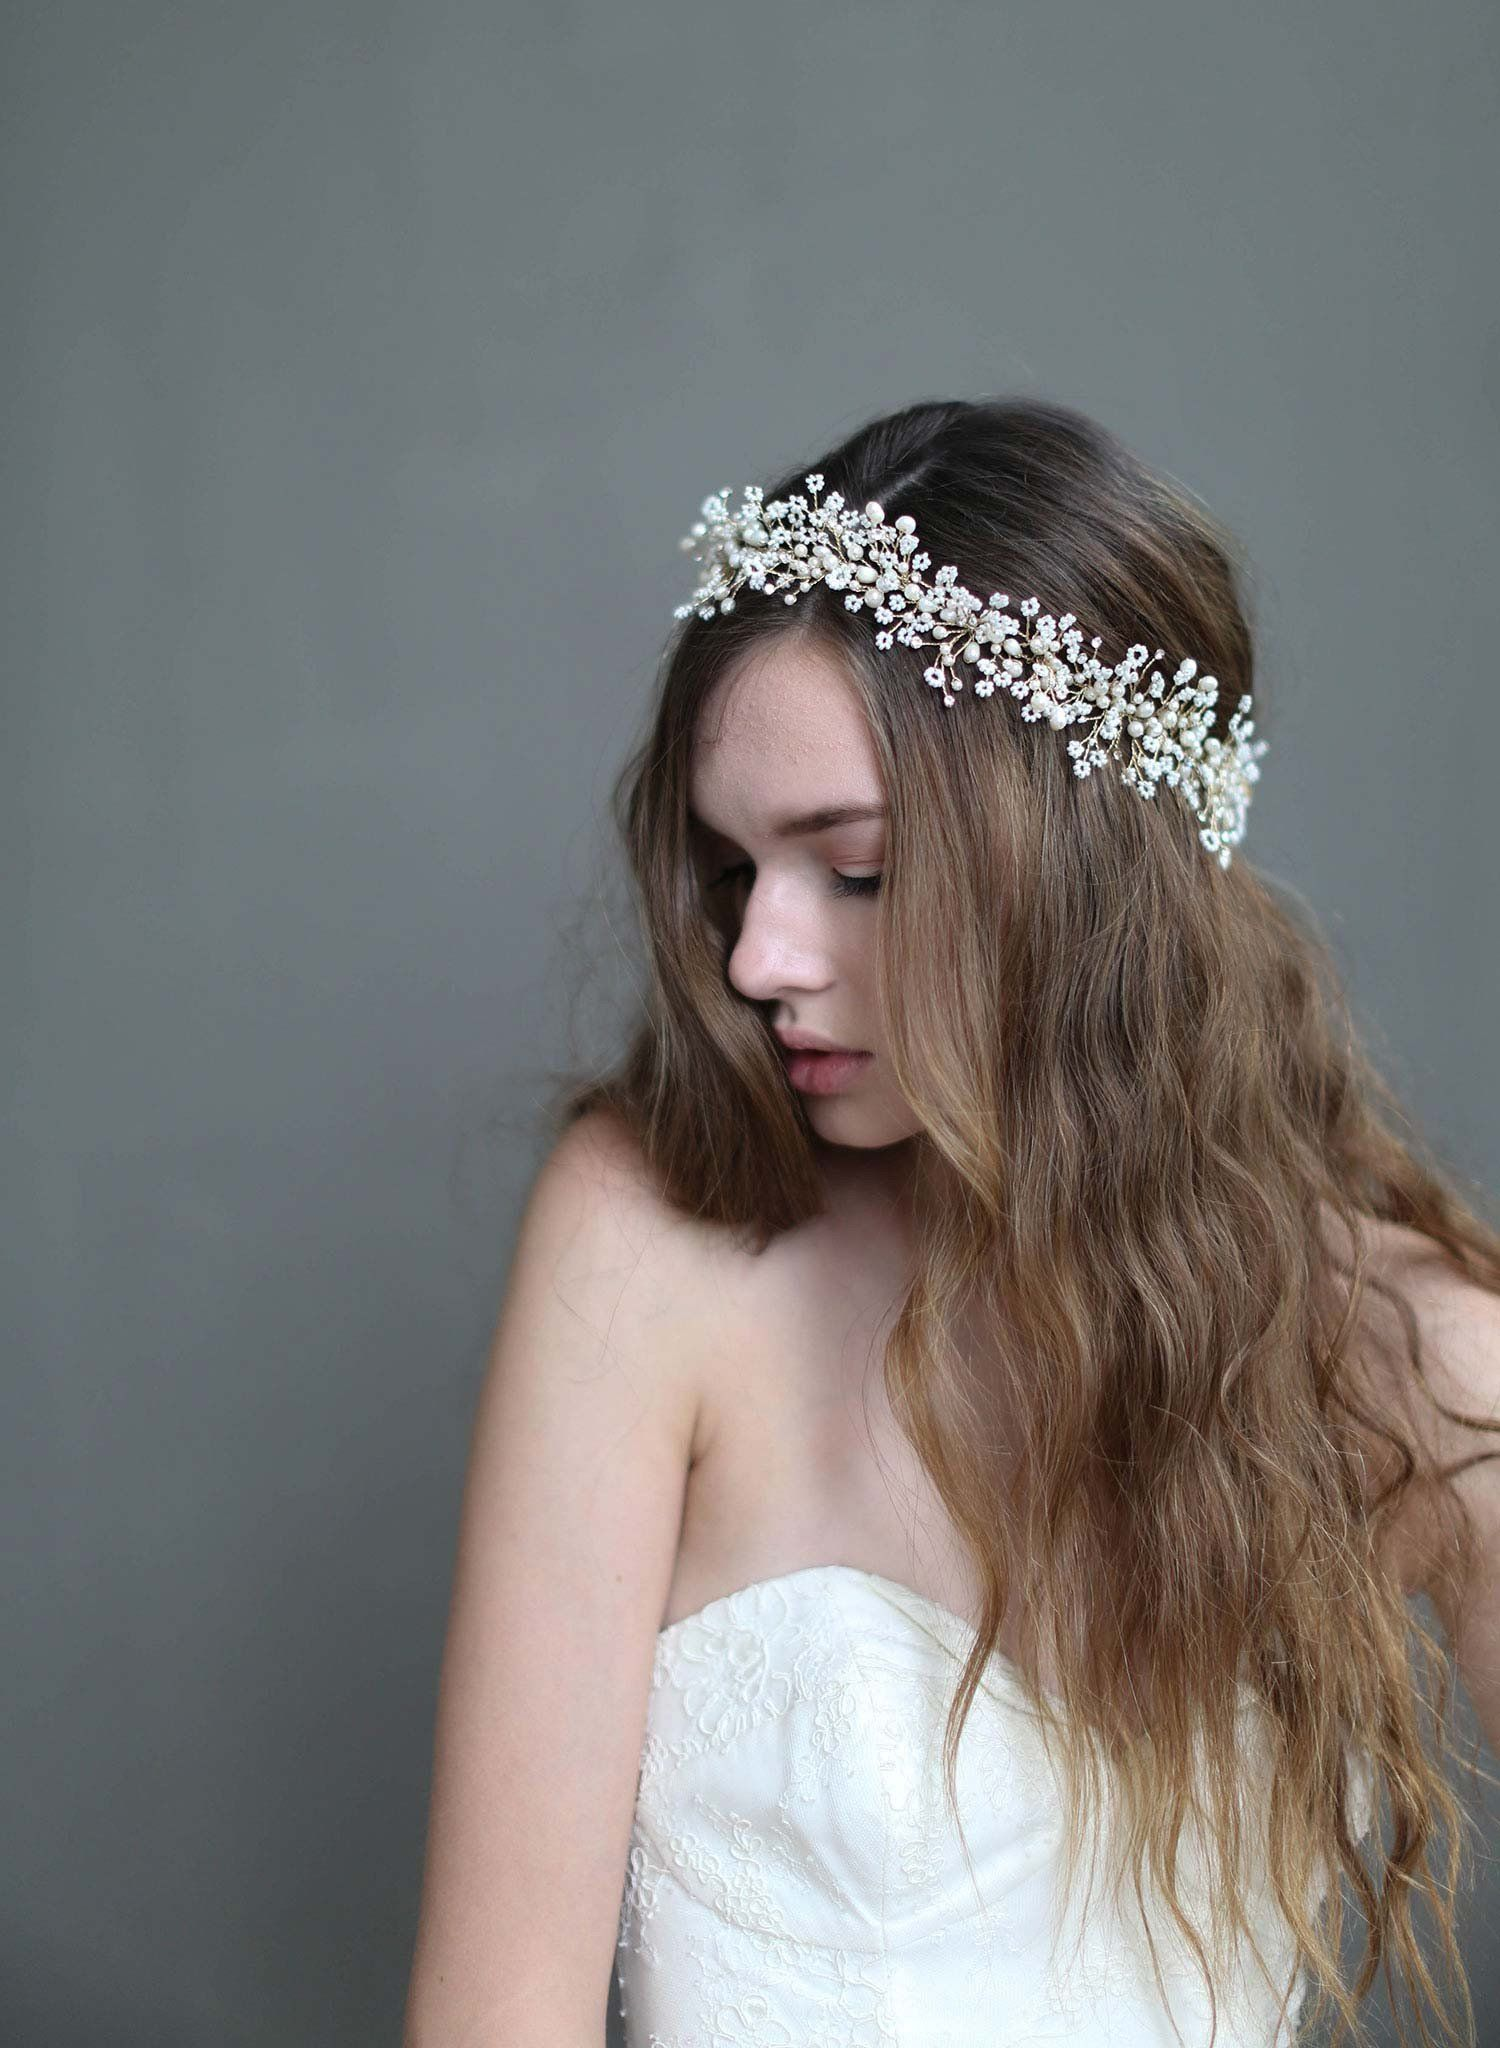 Bridal hair accessories babys breath - Bridal Hair Accessories Babys Breath 2